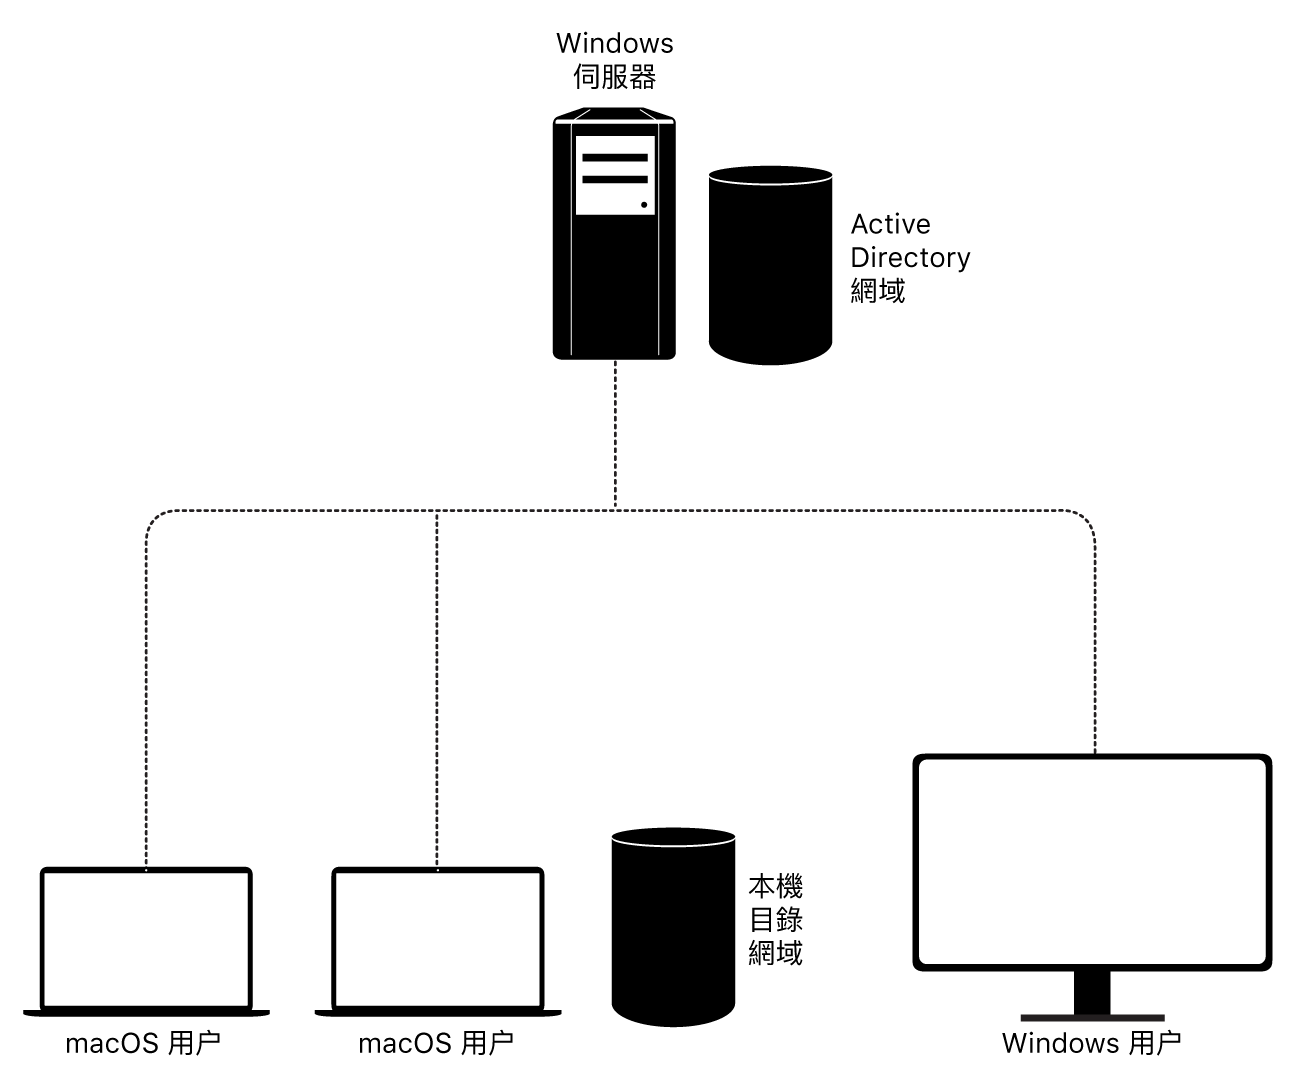 macOS 與 Active Directory 整合